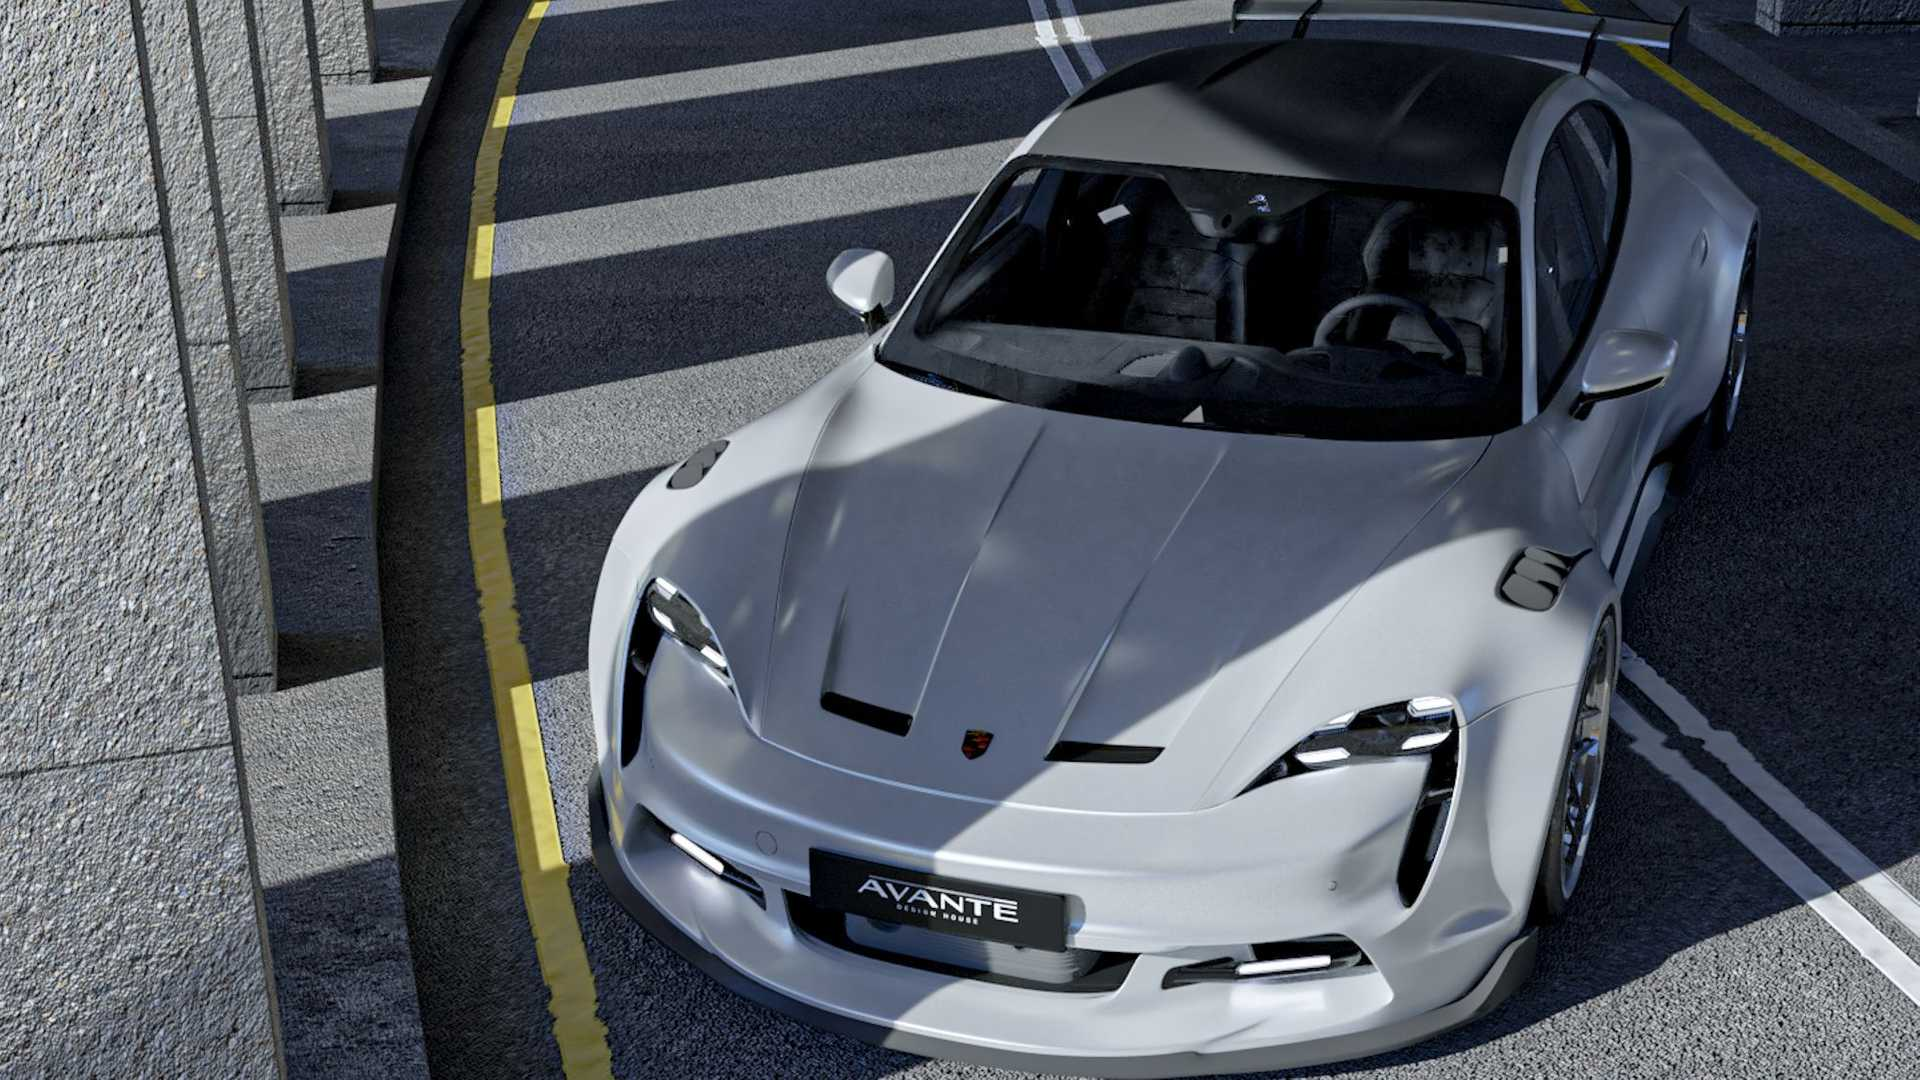 Porsche-Taycan-by-Avante-Design-4